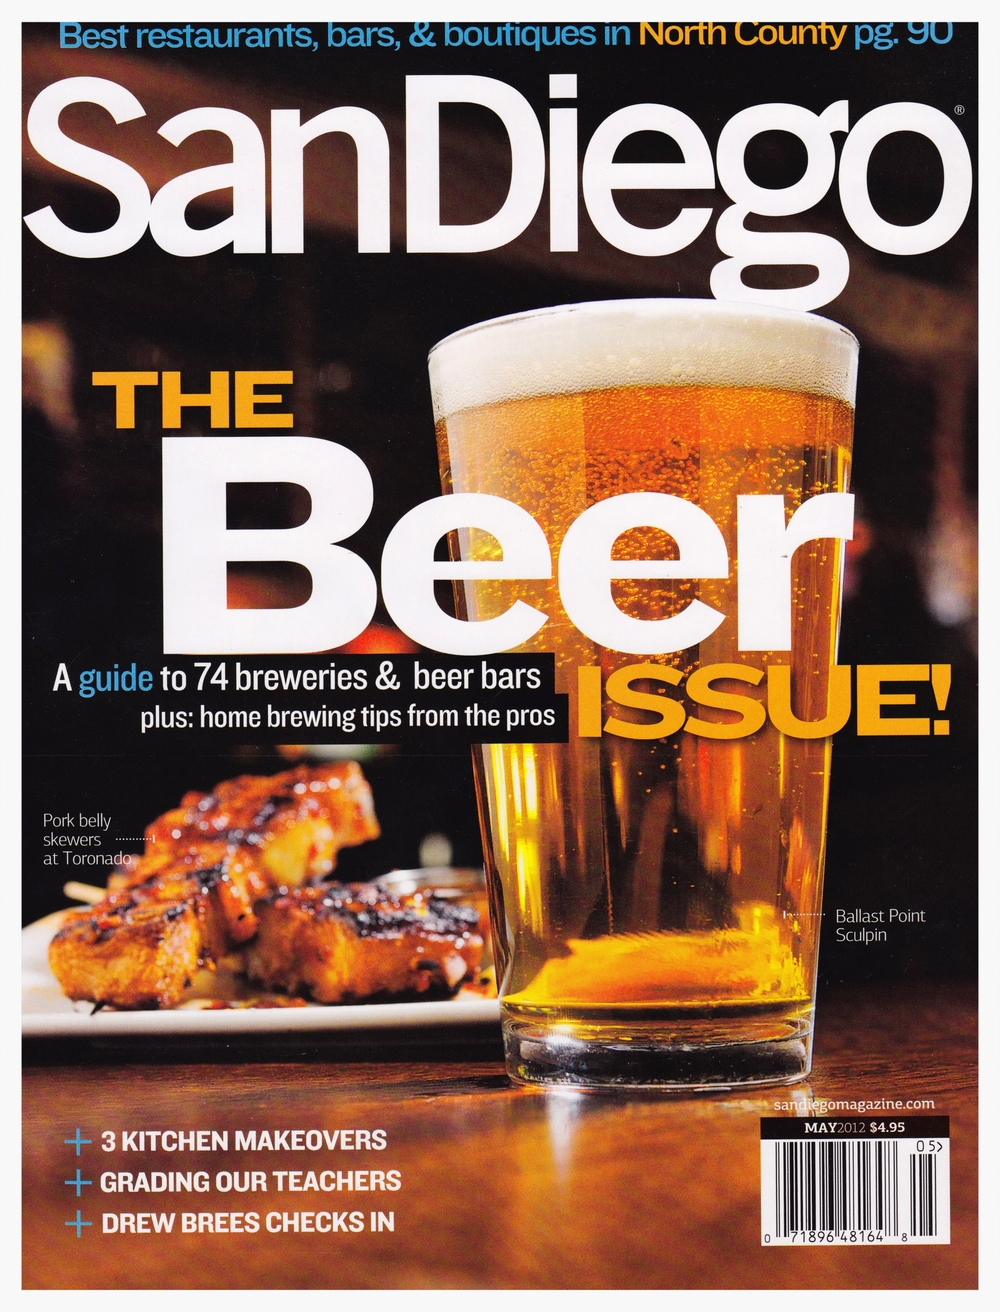 SDM_May 2012 Cover.jpeg